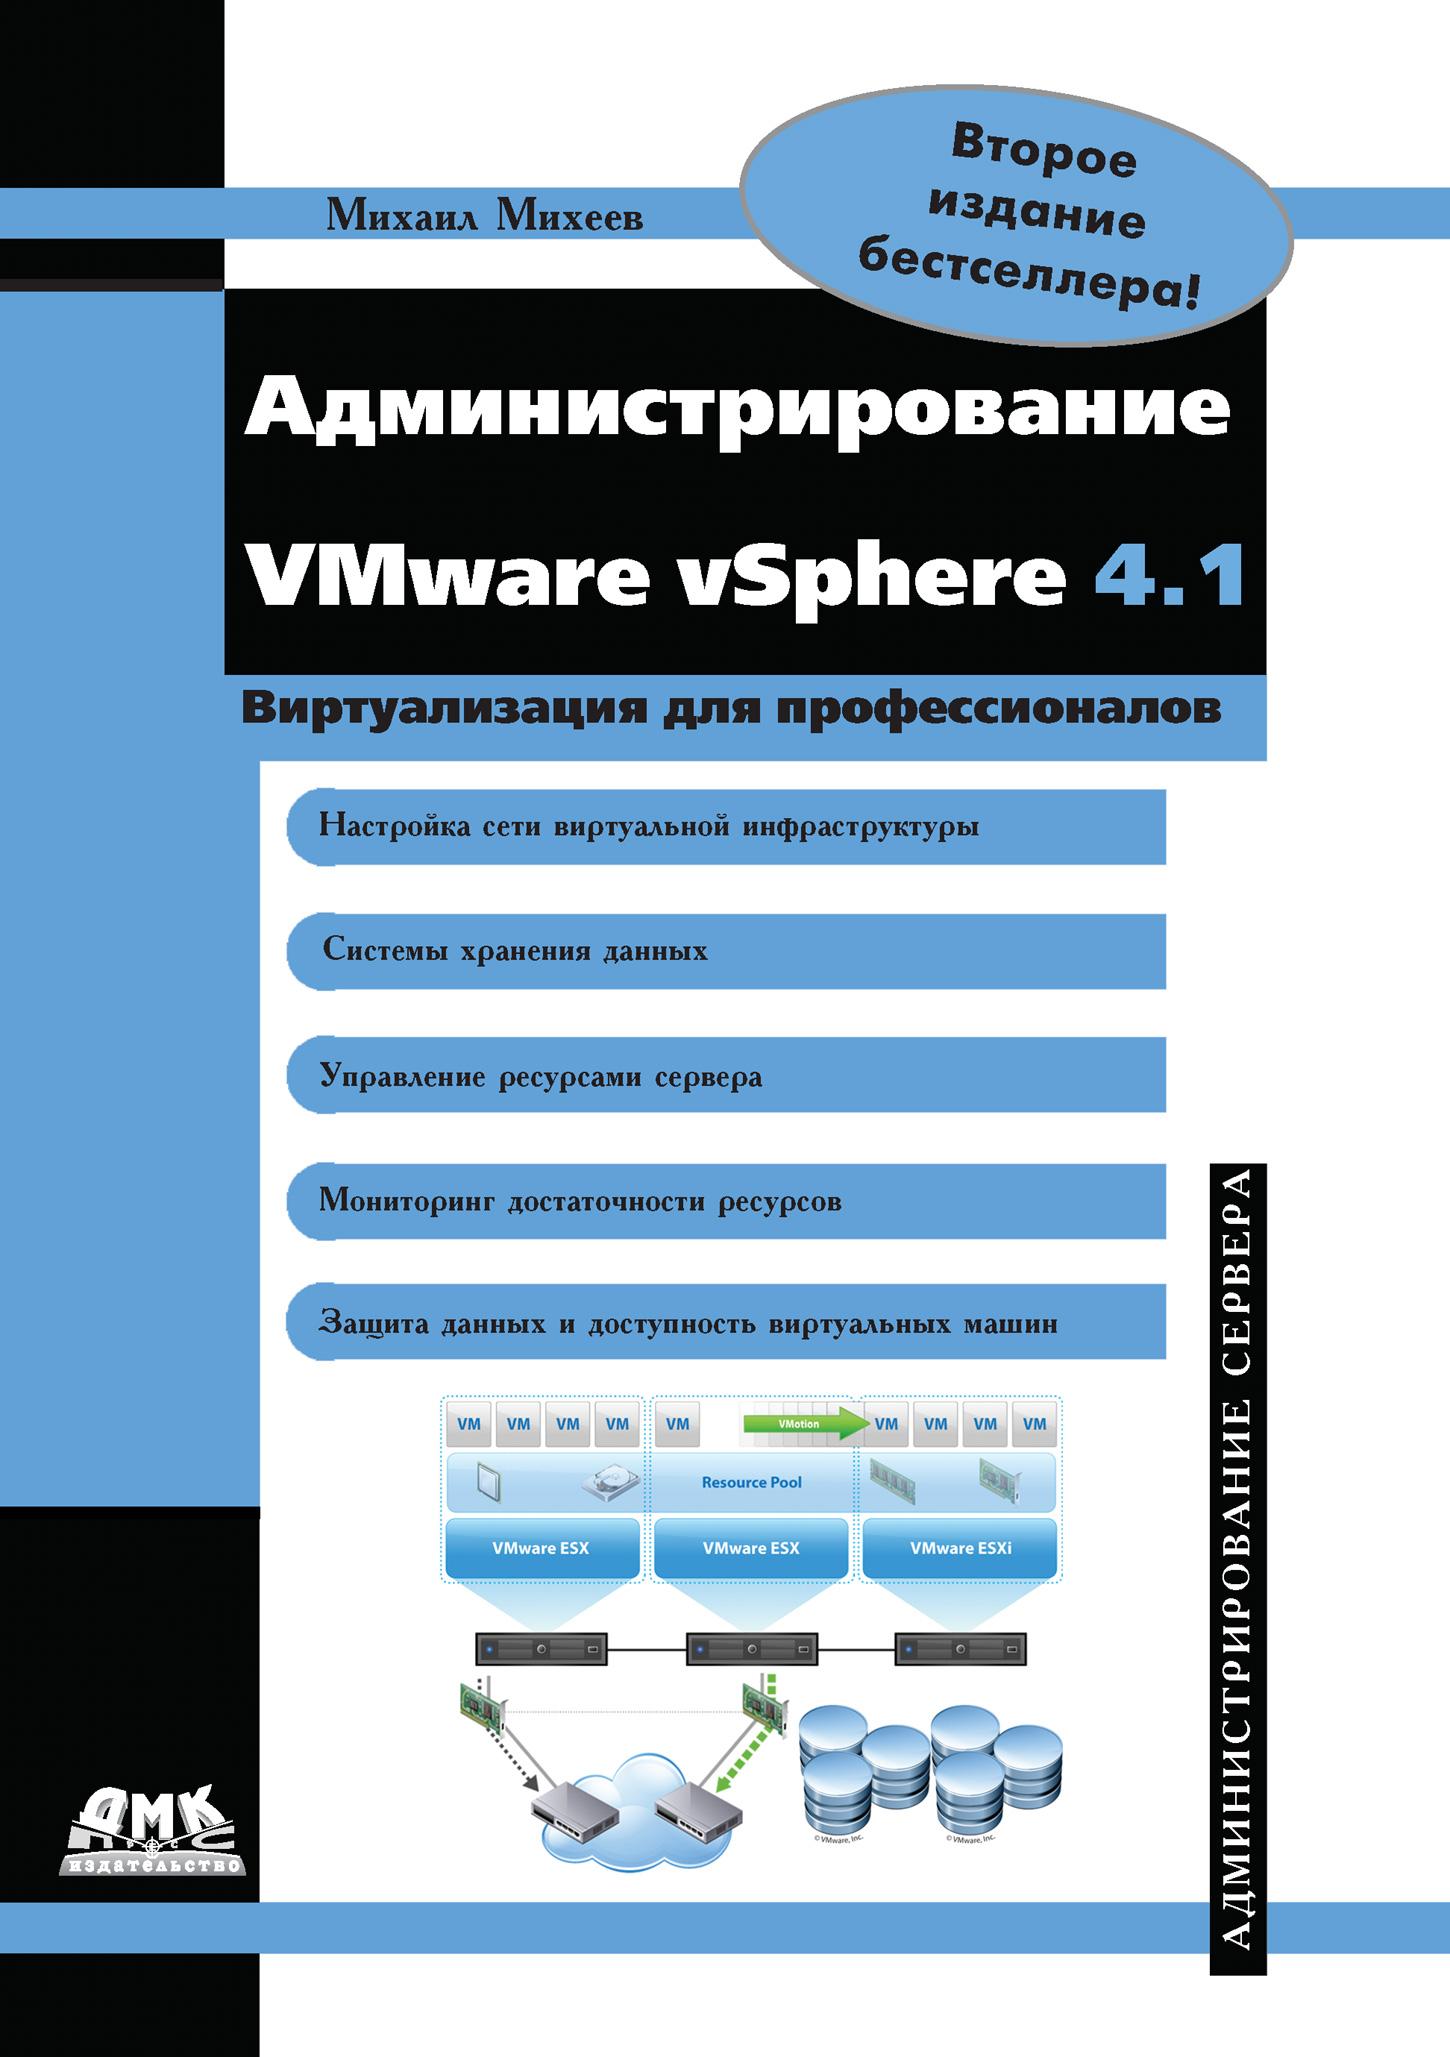 Михаил Олегович Михеев Администрирование VMware vSphere 4.1 nick marshall mastering vmware vsphere 6